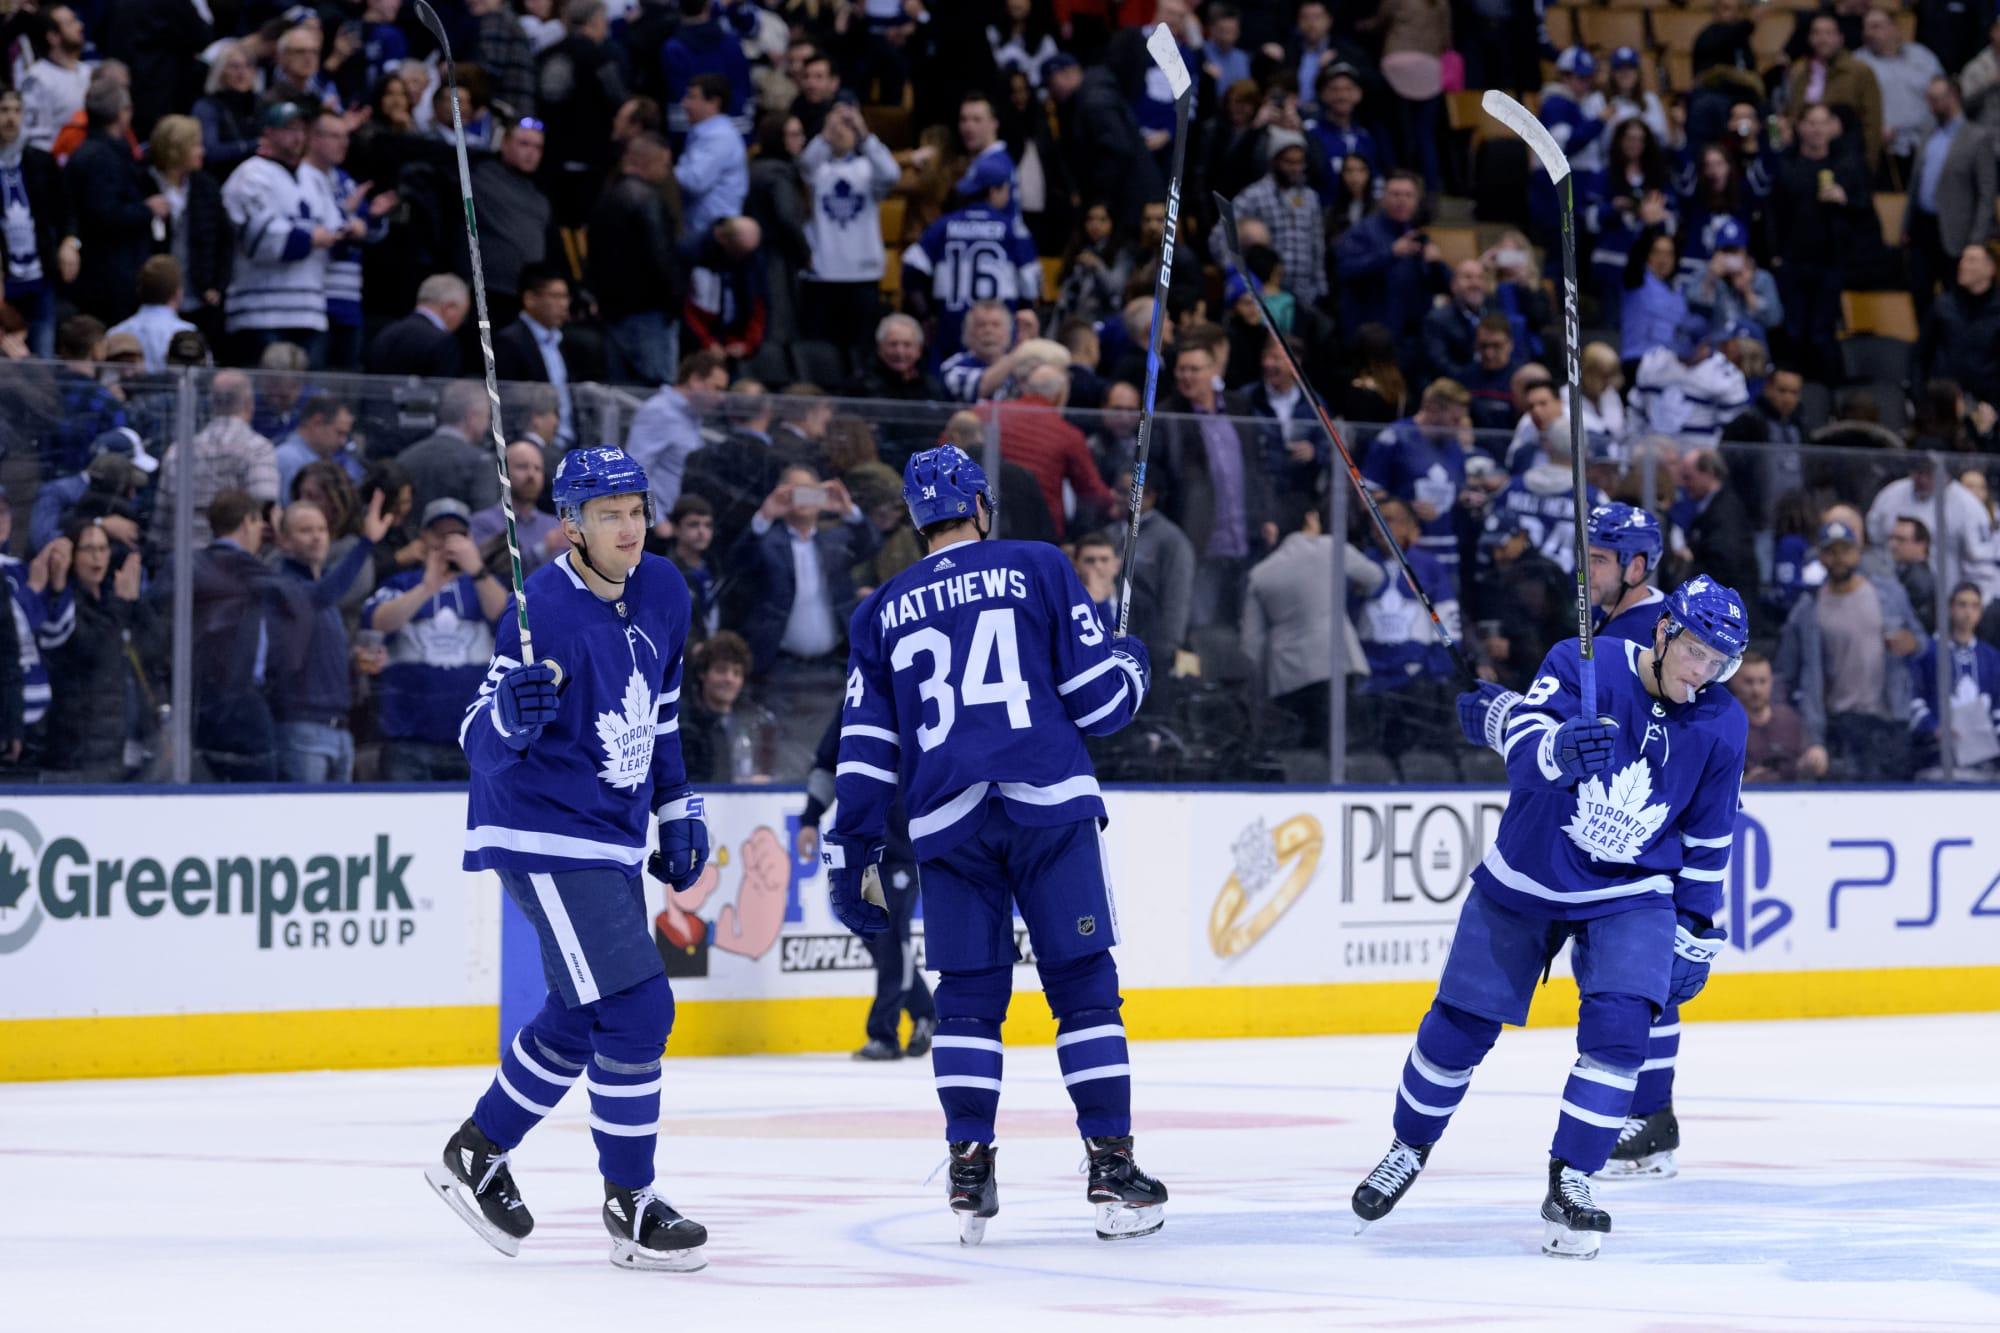 Toronto Maple Leafs 5 Burning Questions For 2018 19 Season